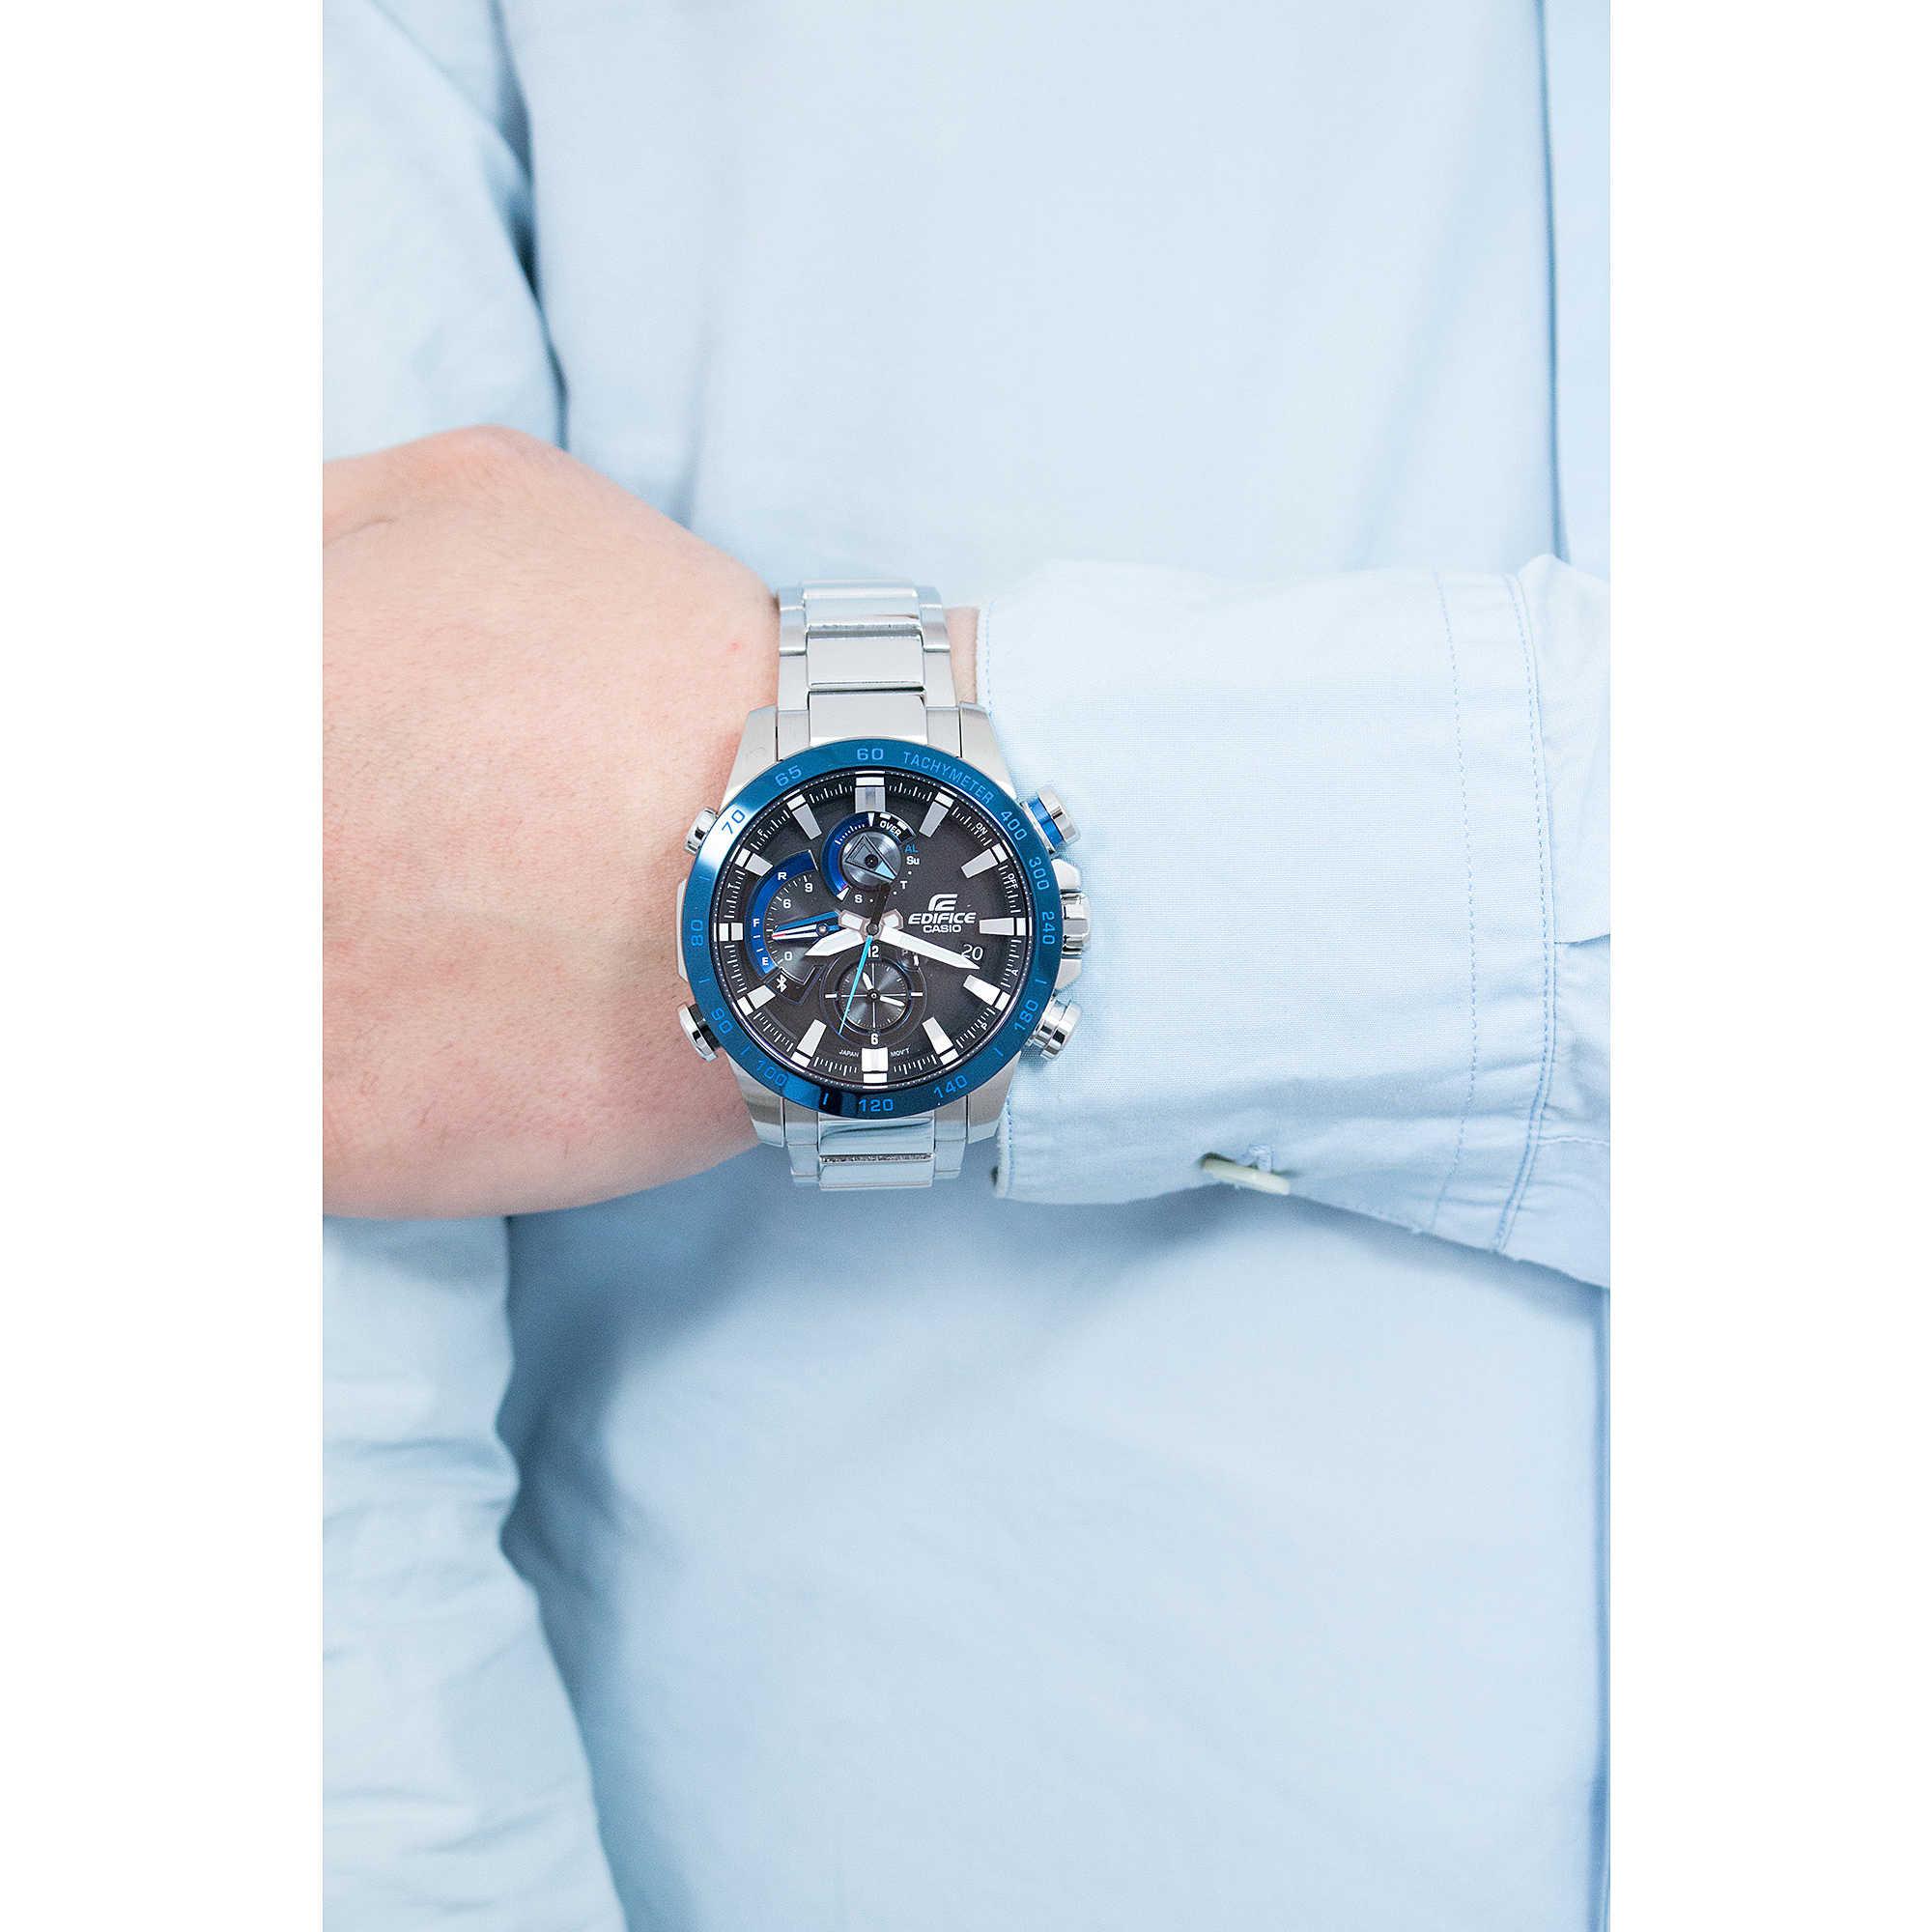 Casio Edifice Eqb 501xdb 1a Mineral Glass Silver Watch Intl Daftar Efr 501d 7av Jam Tangan Pria Zoom